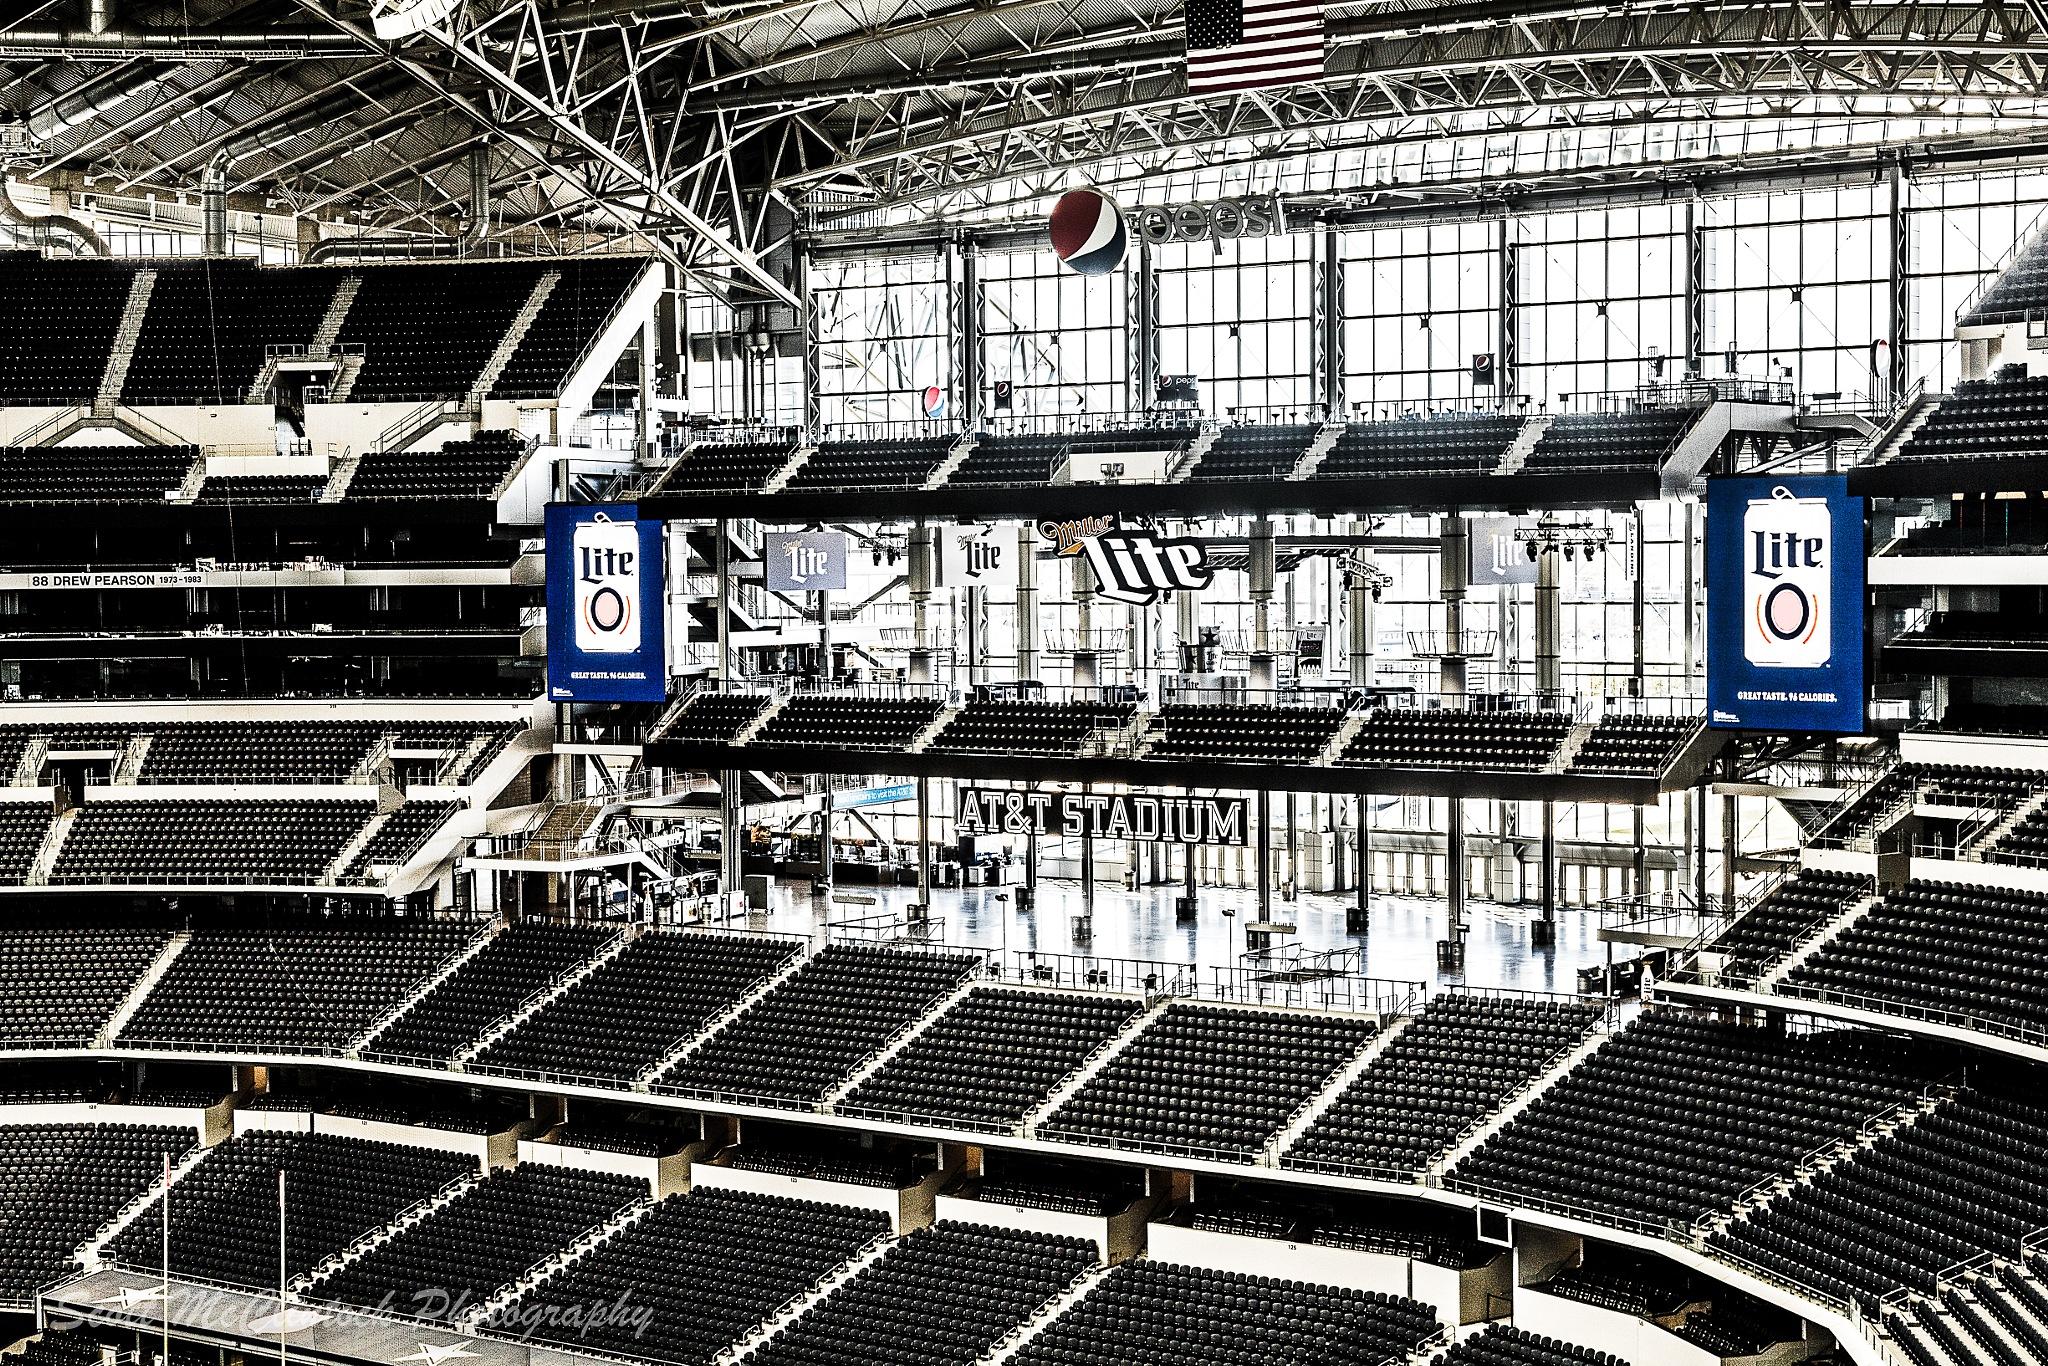 AT&T Stadium by Scottmcc